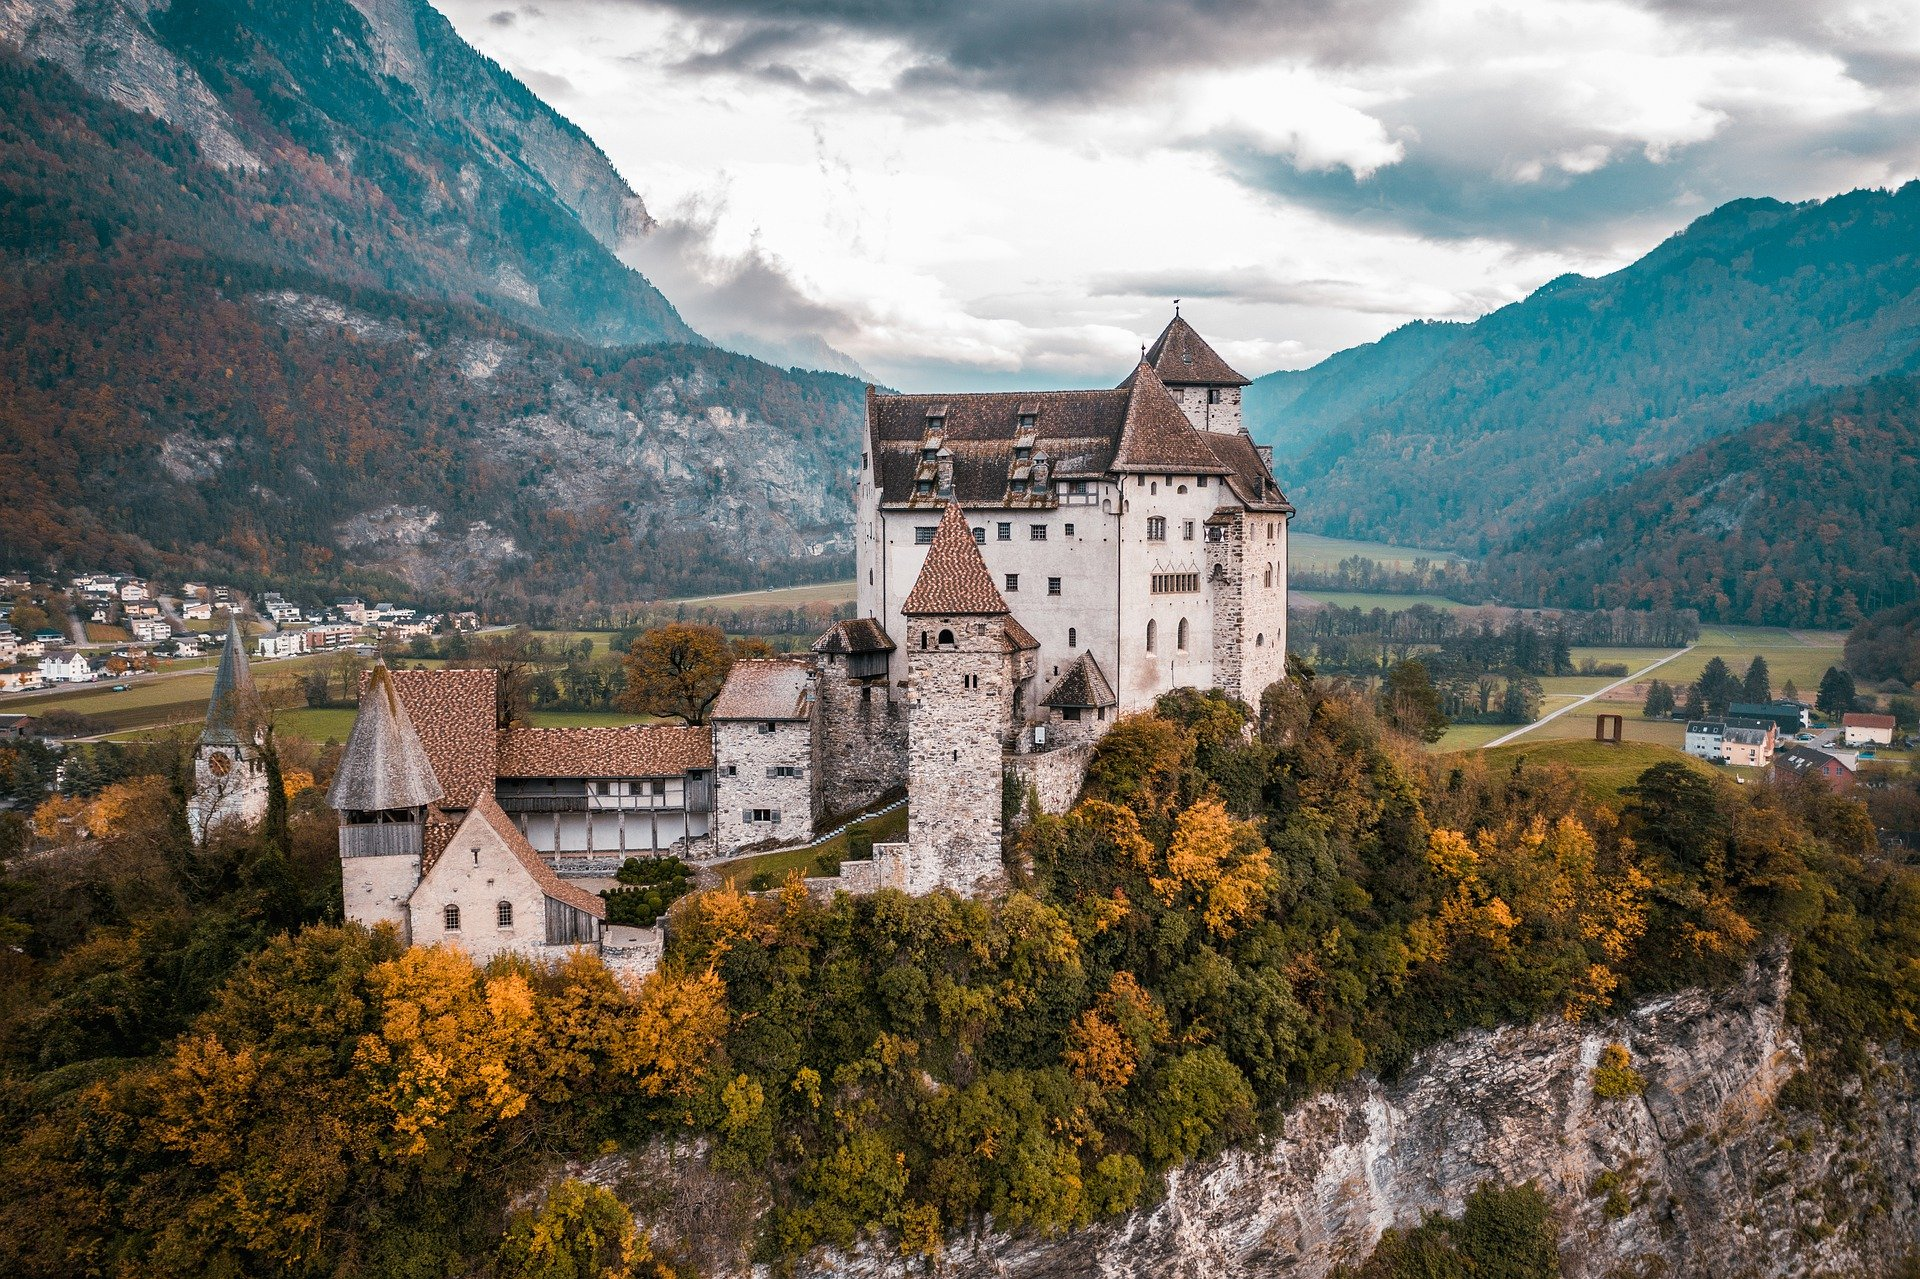 castle-5693094_1920.jpg